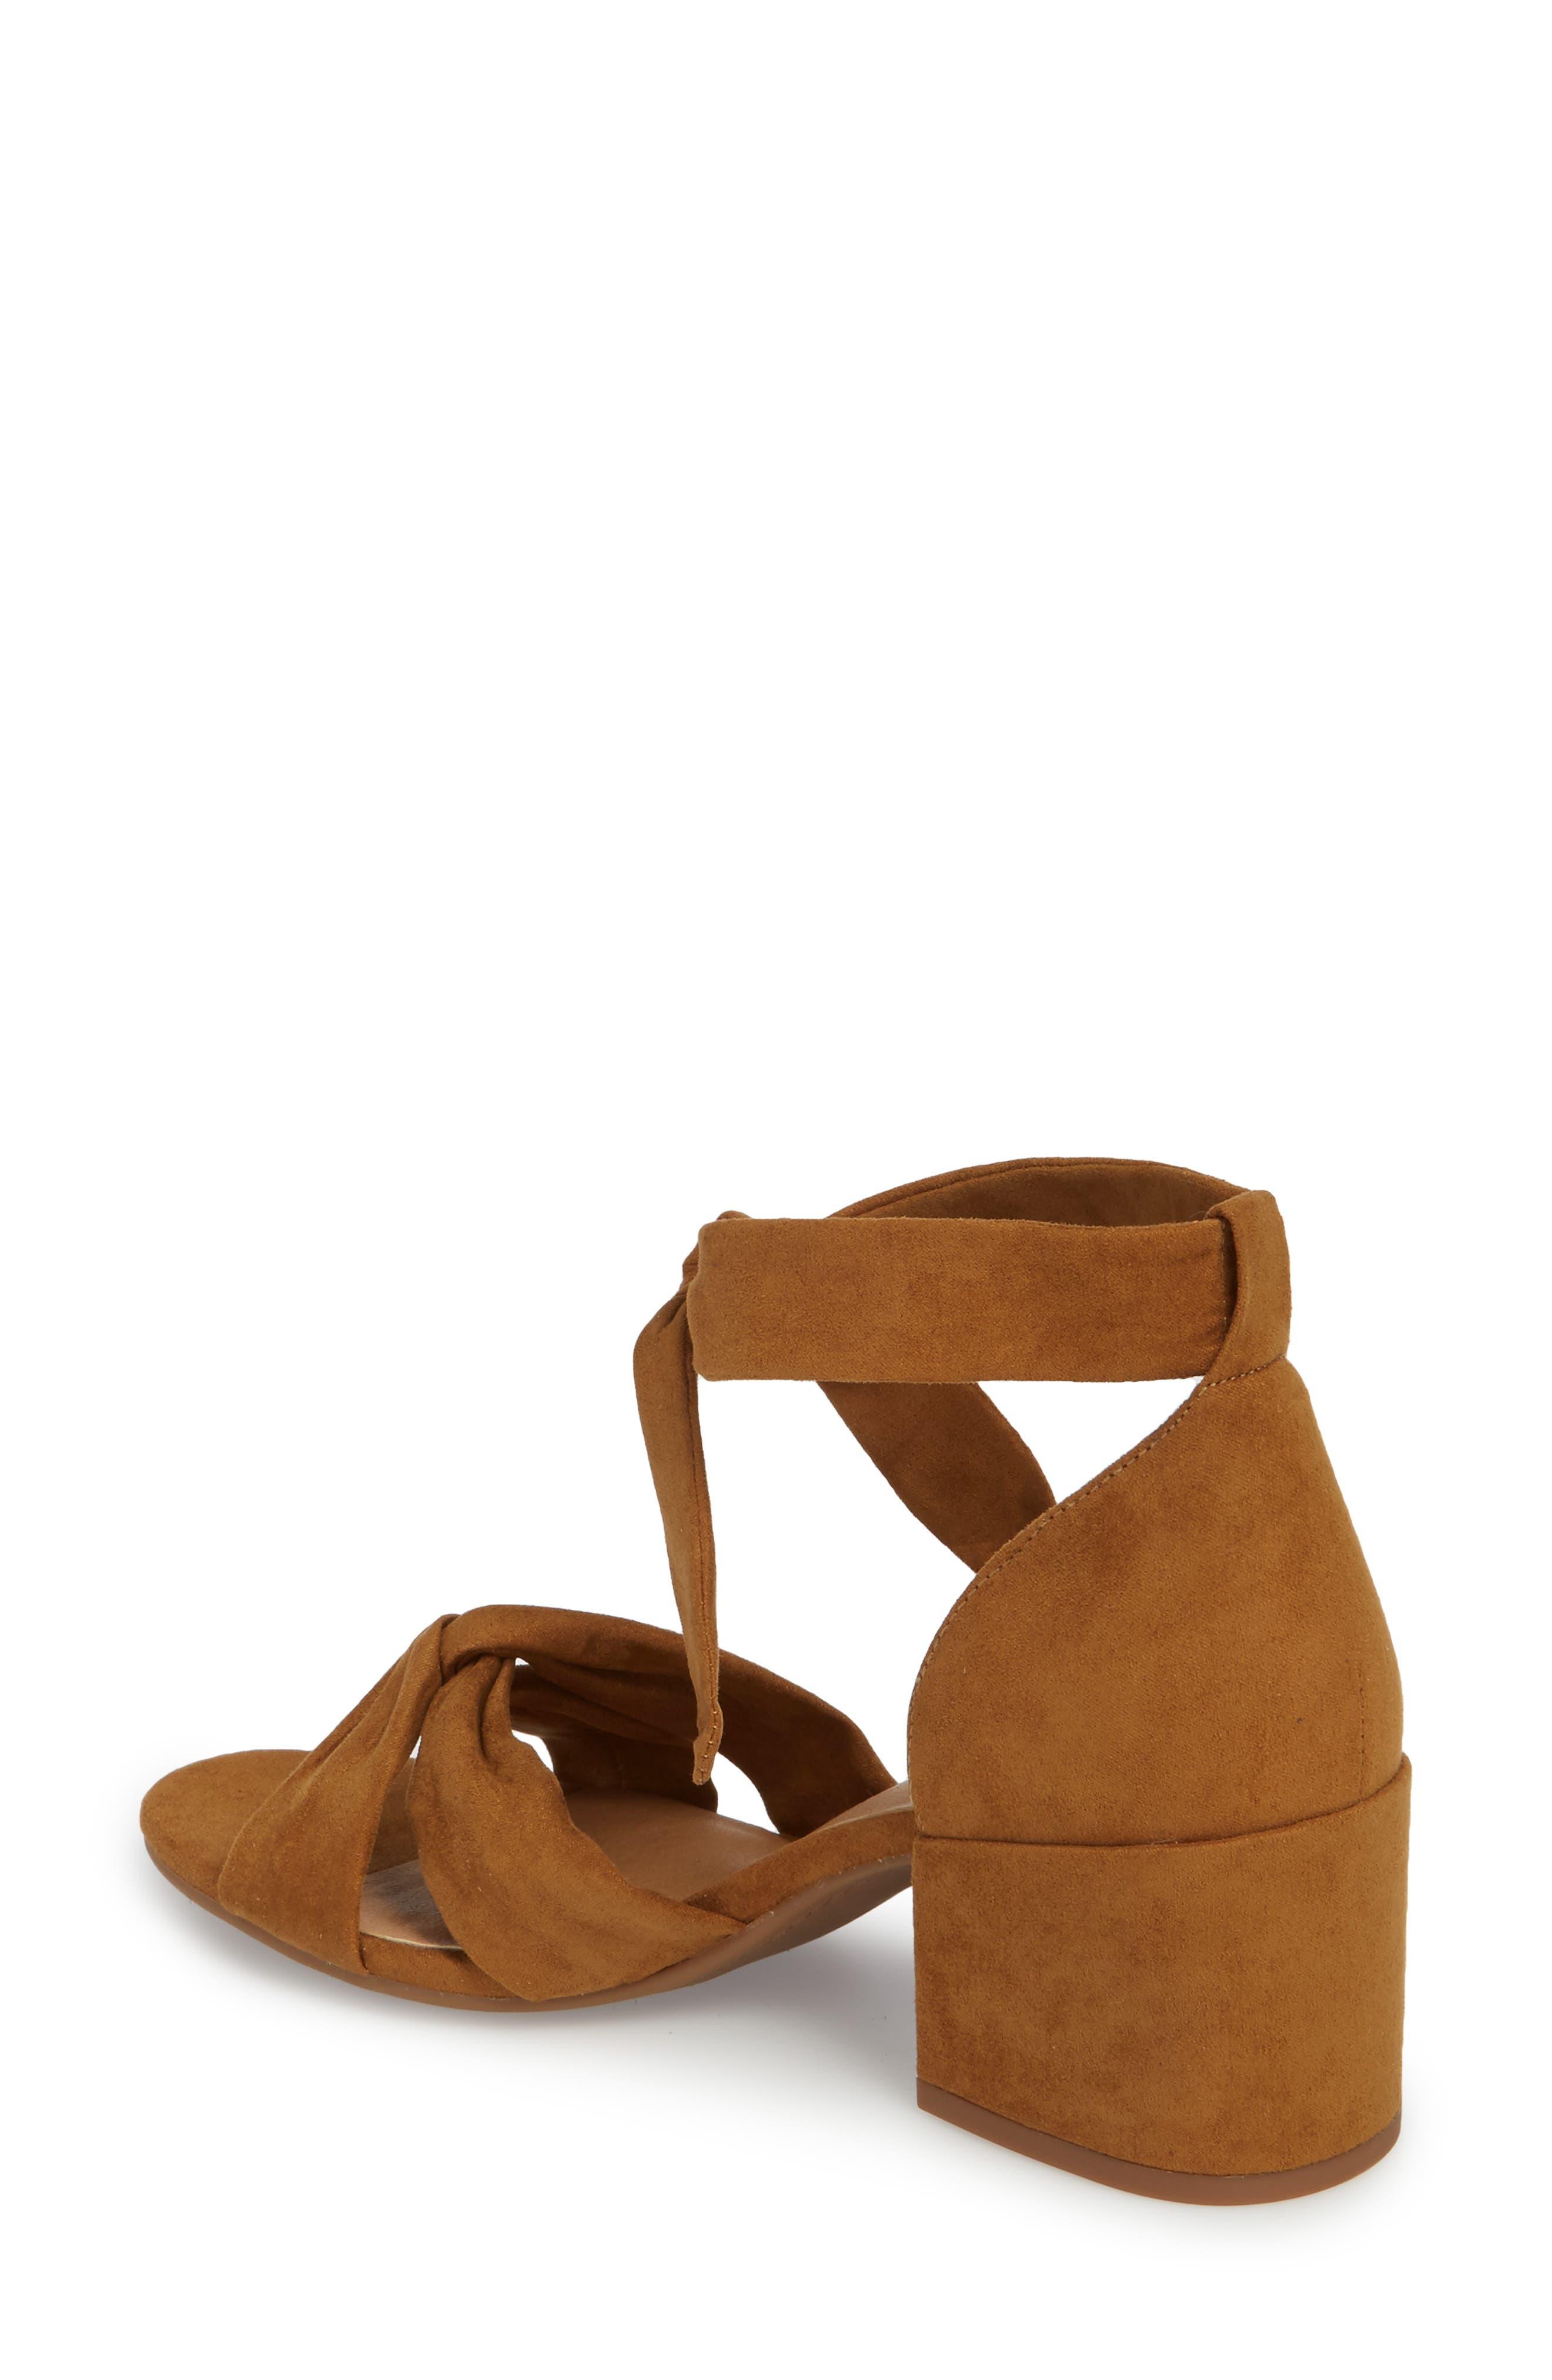 Xaylah Ankle Strap Sandal,                             Alternate thumbnail 9, color,